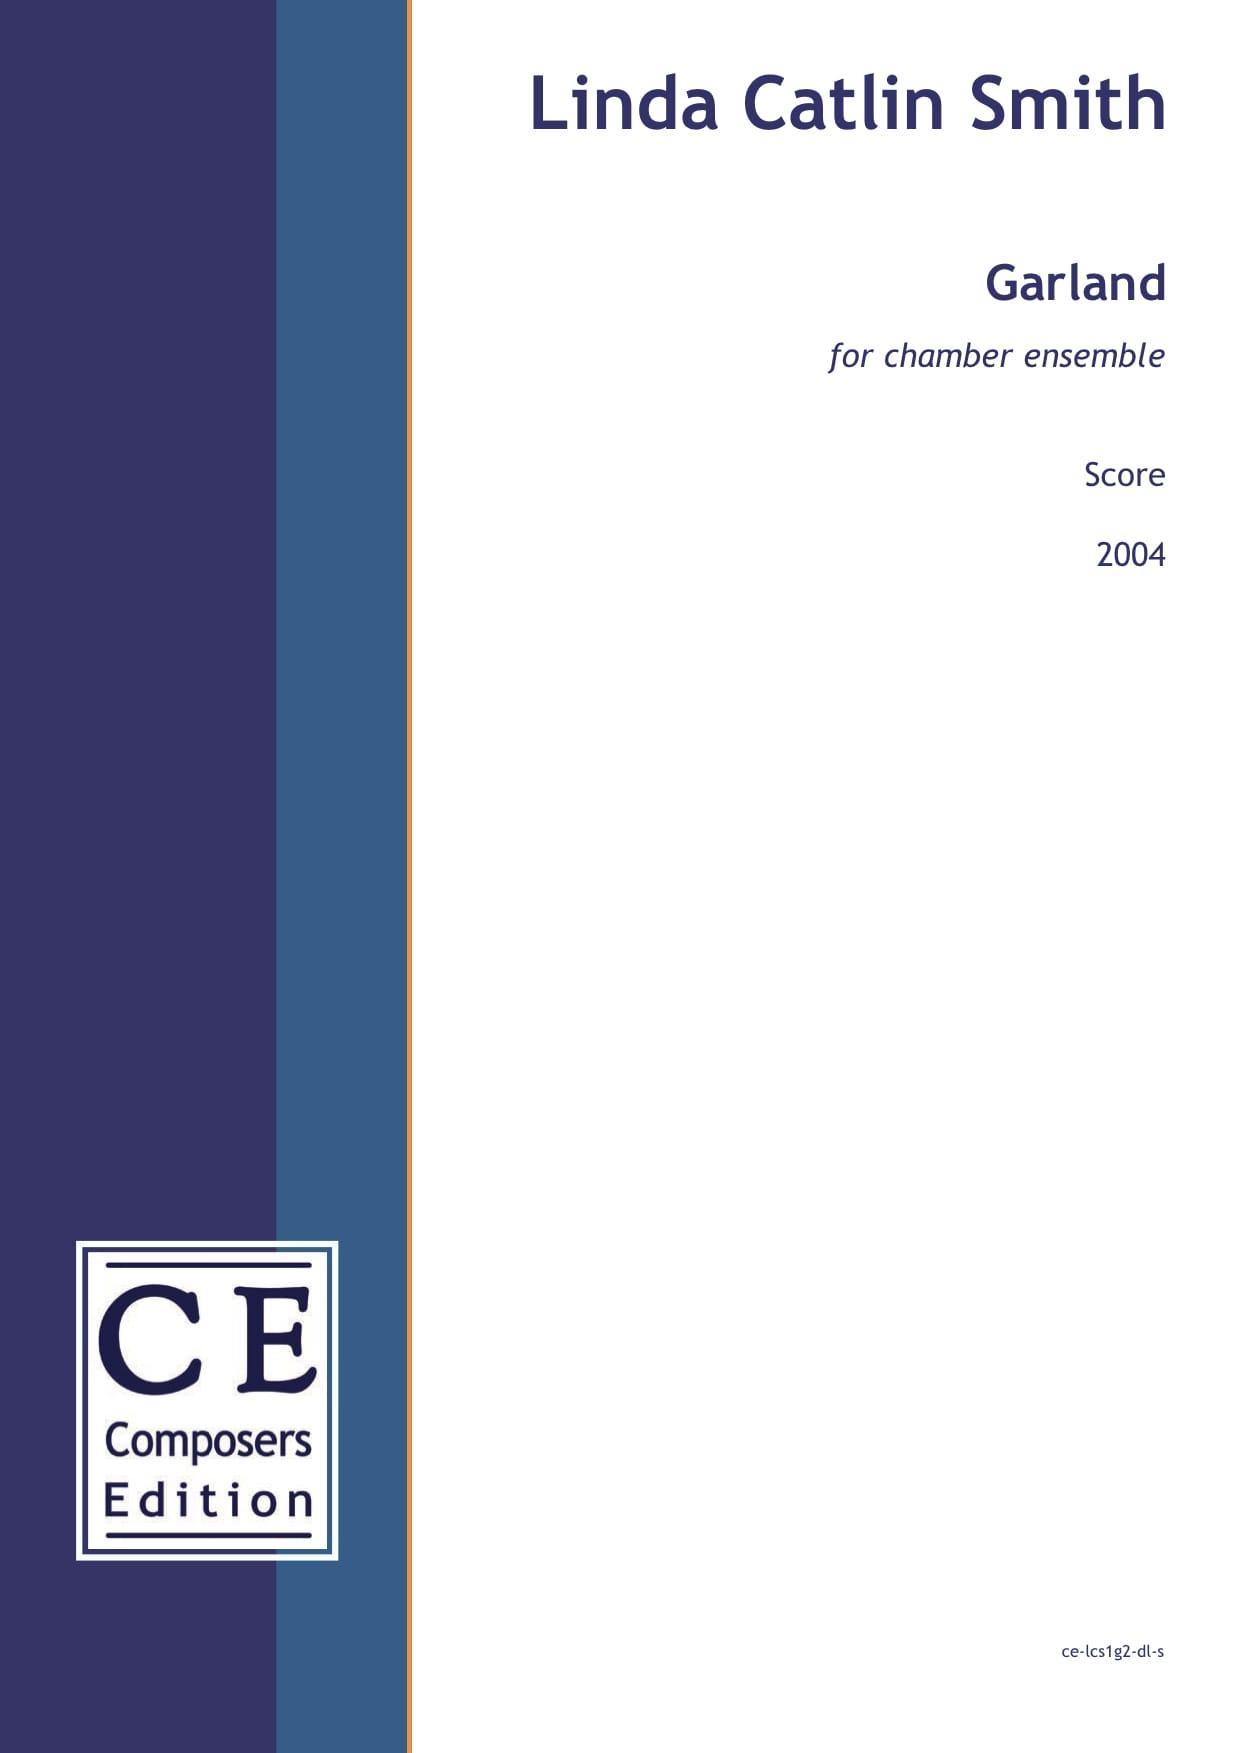 Linda Catlin Smith: Garland for chamber ensemble